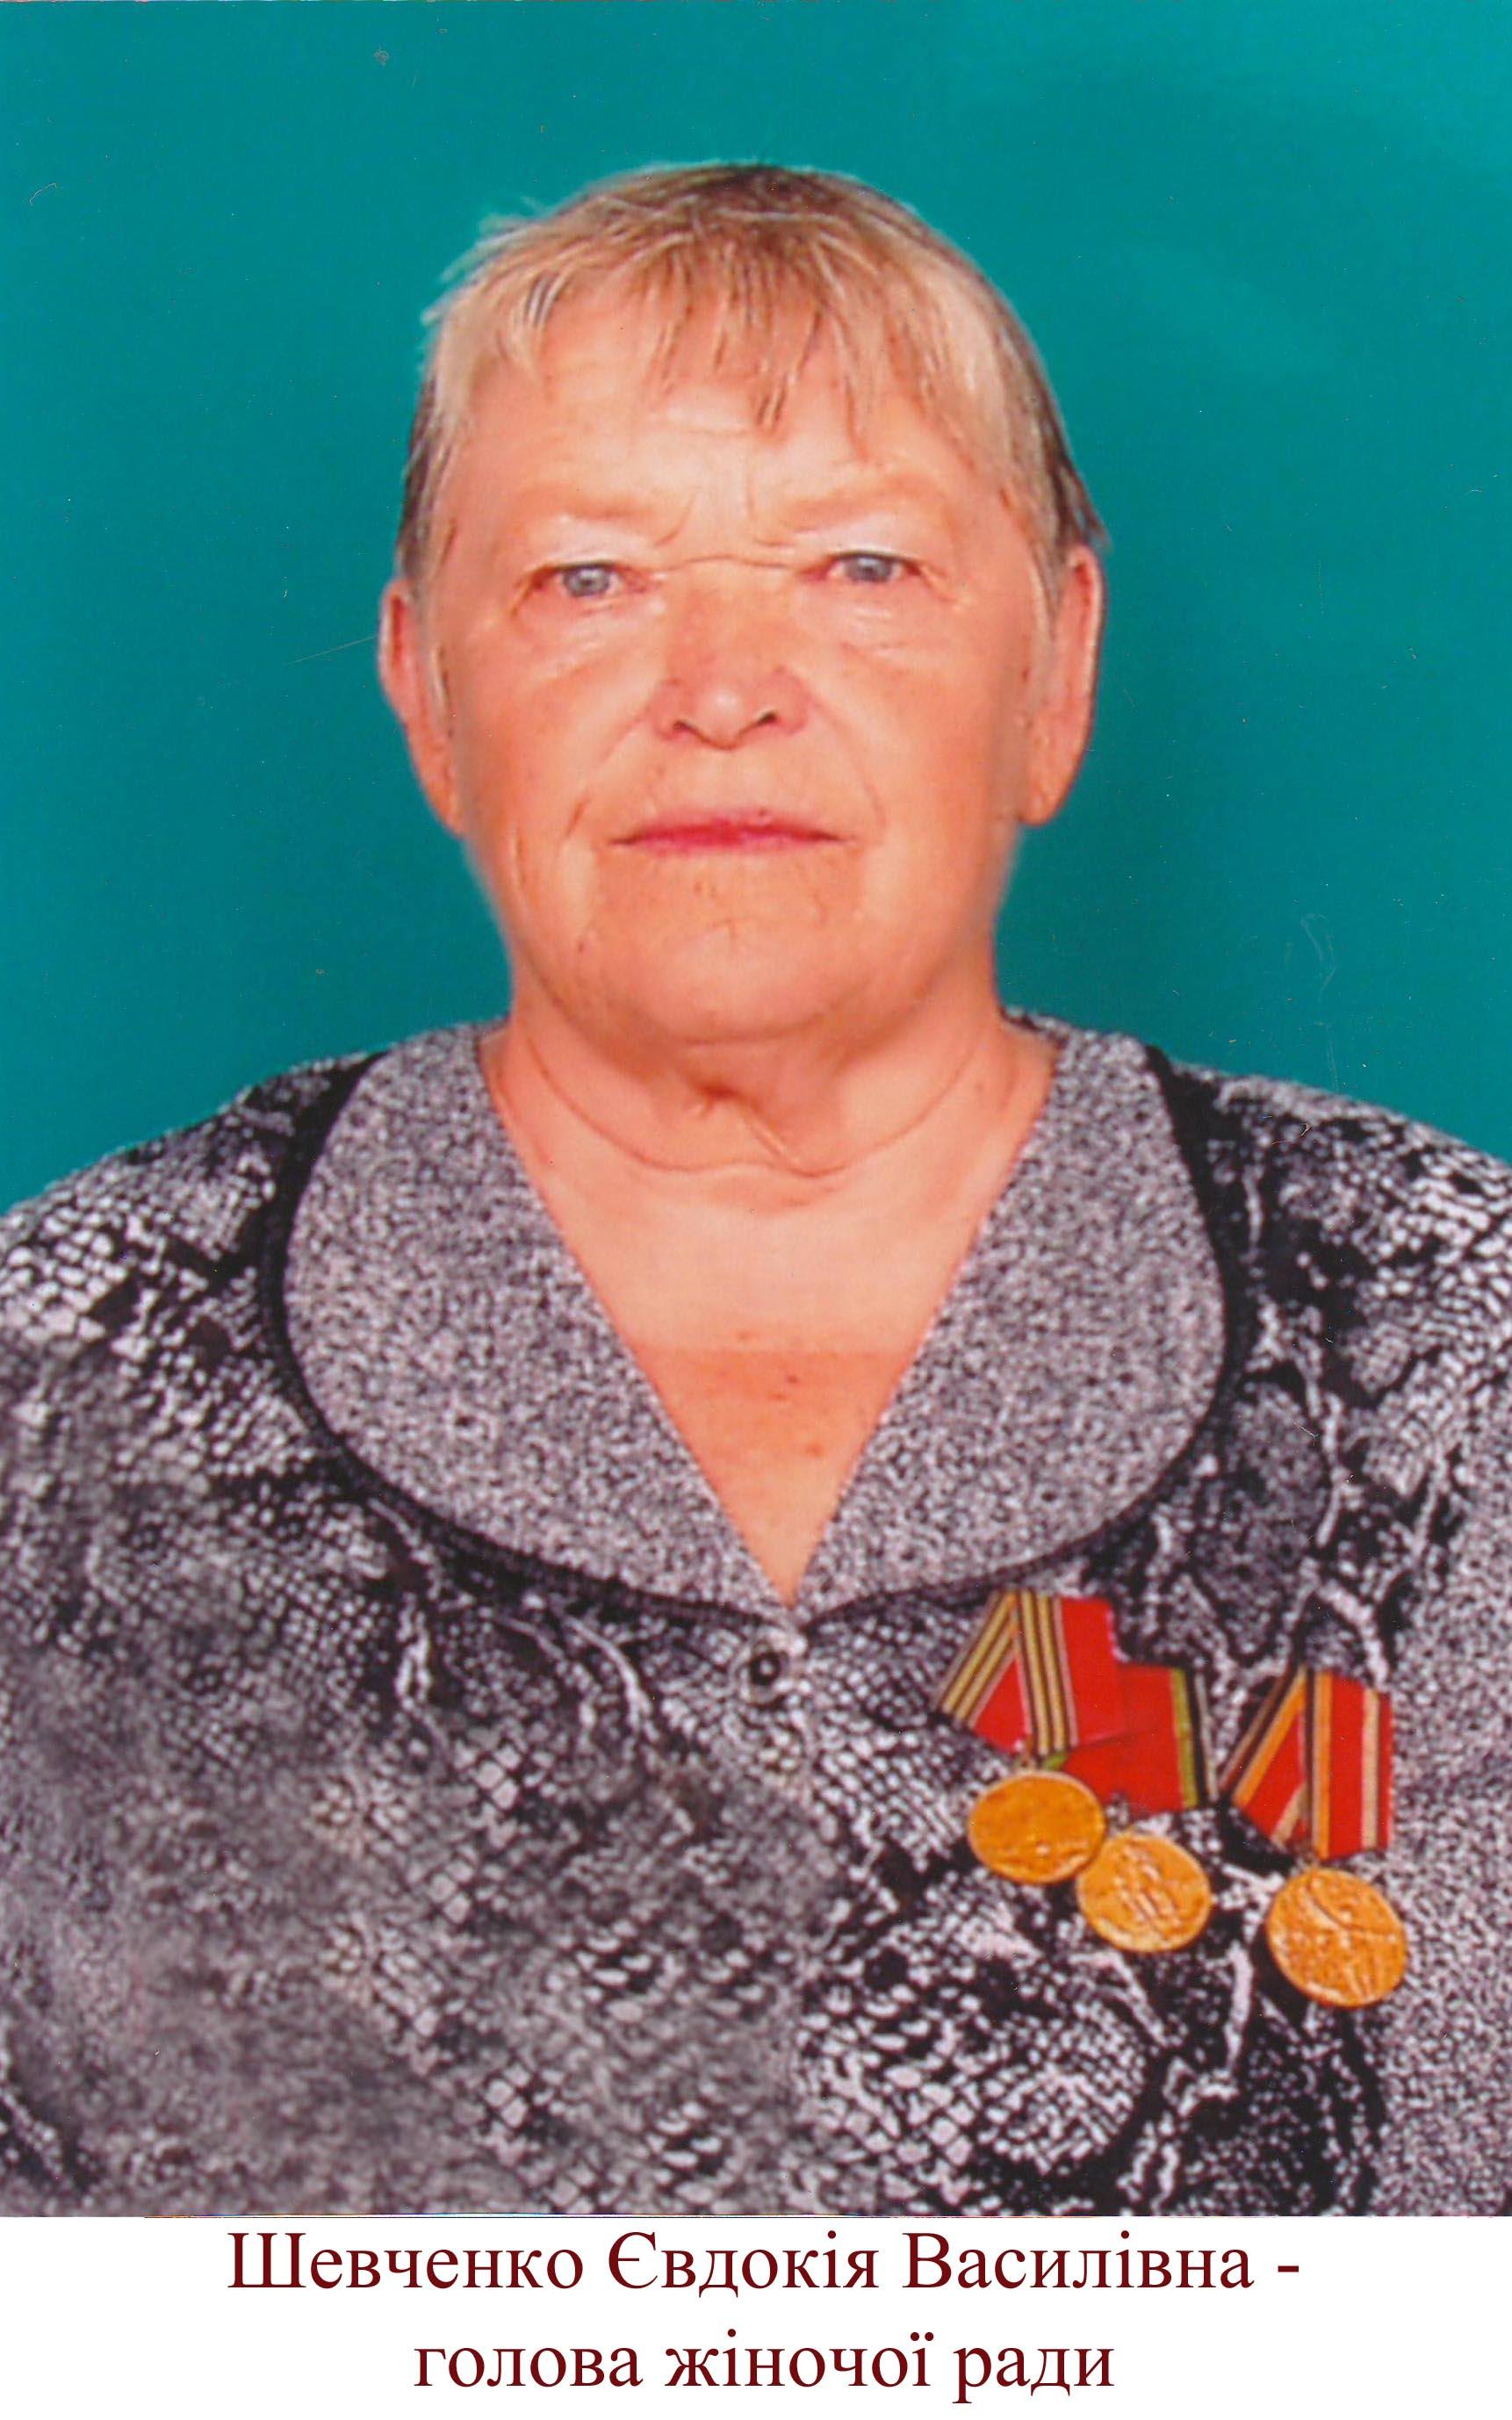 Шевченко Є В